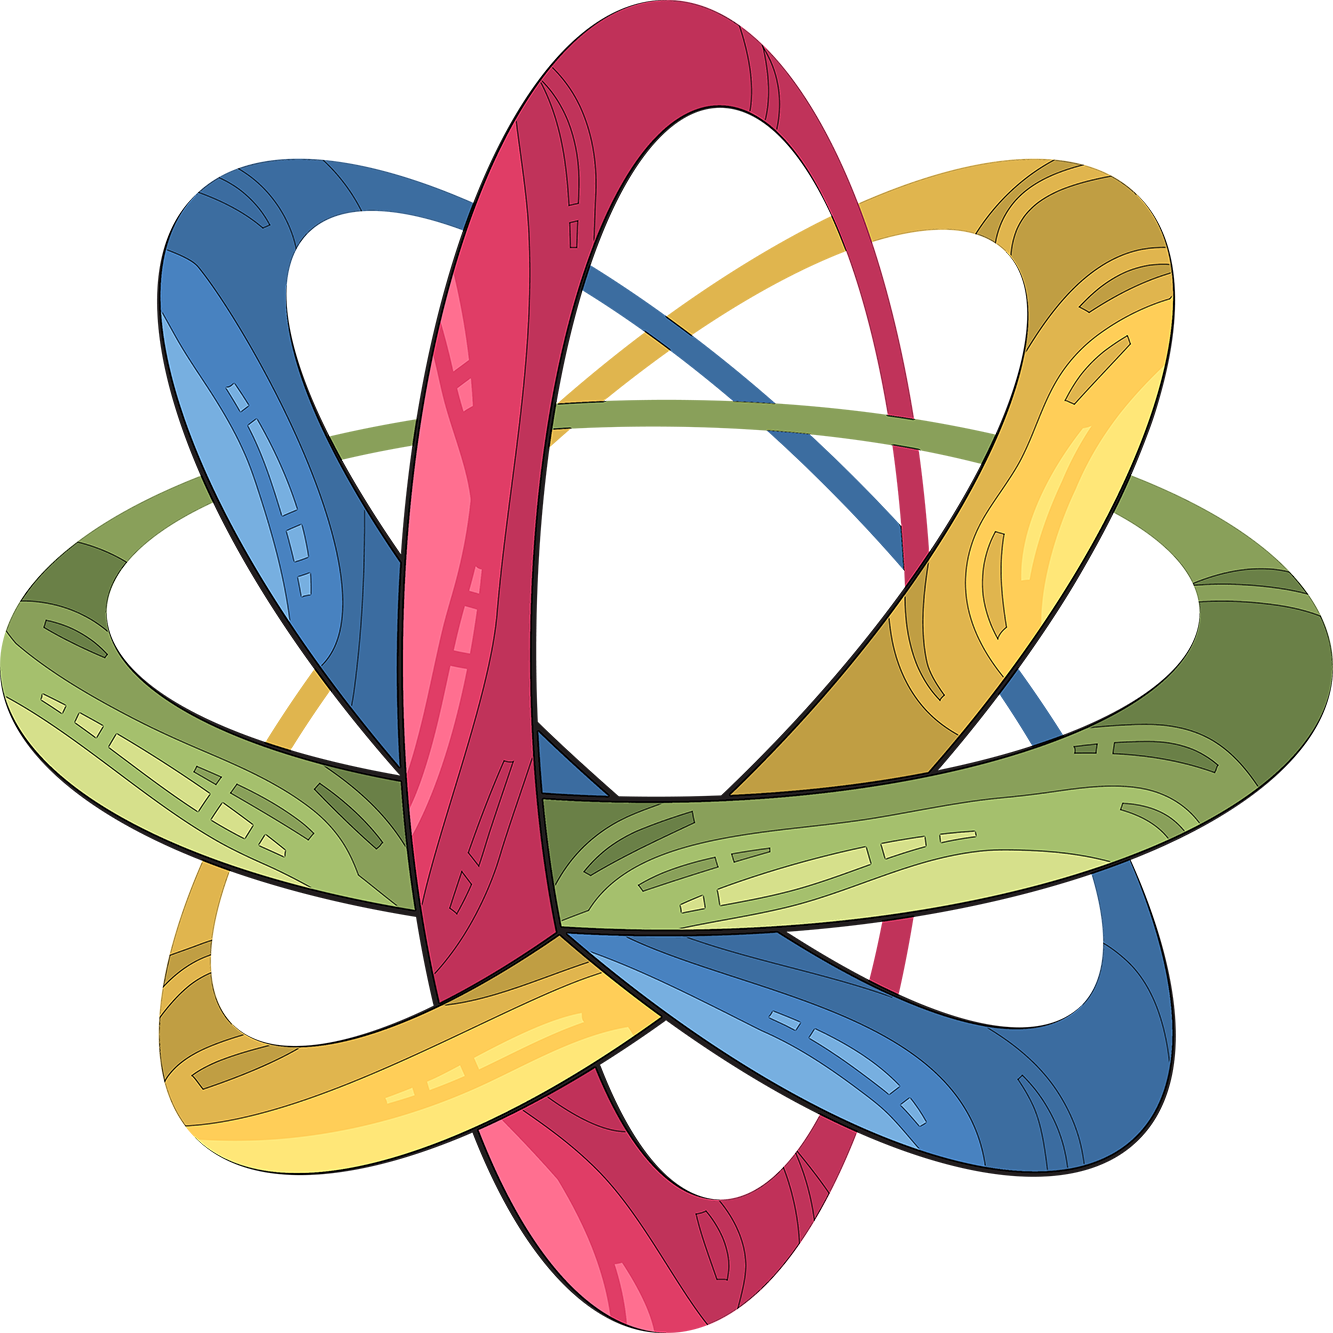 Science Tools Clip Art N4 free image.